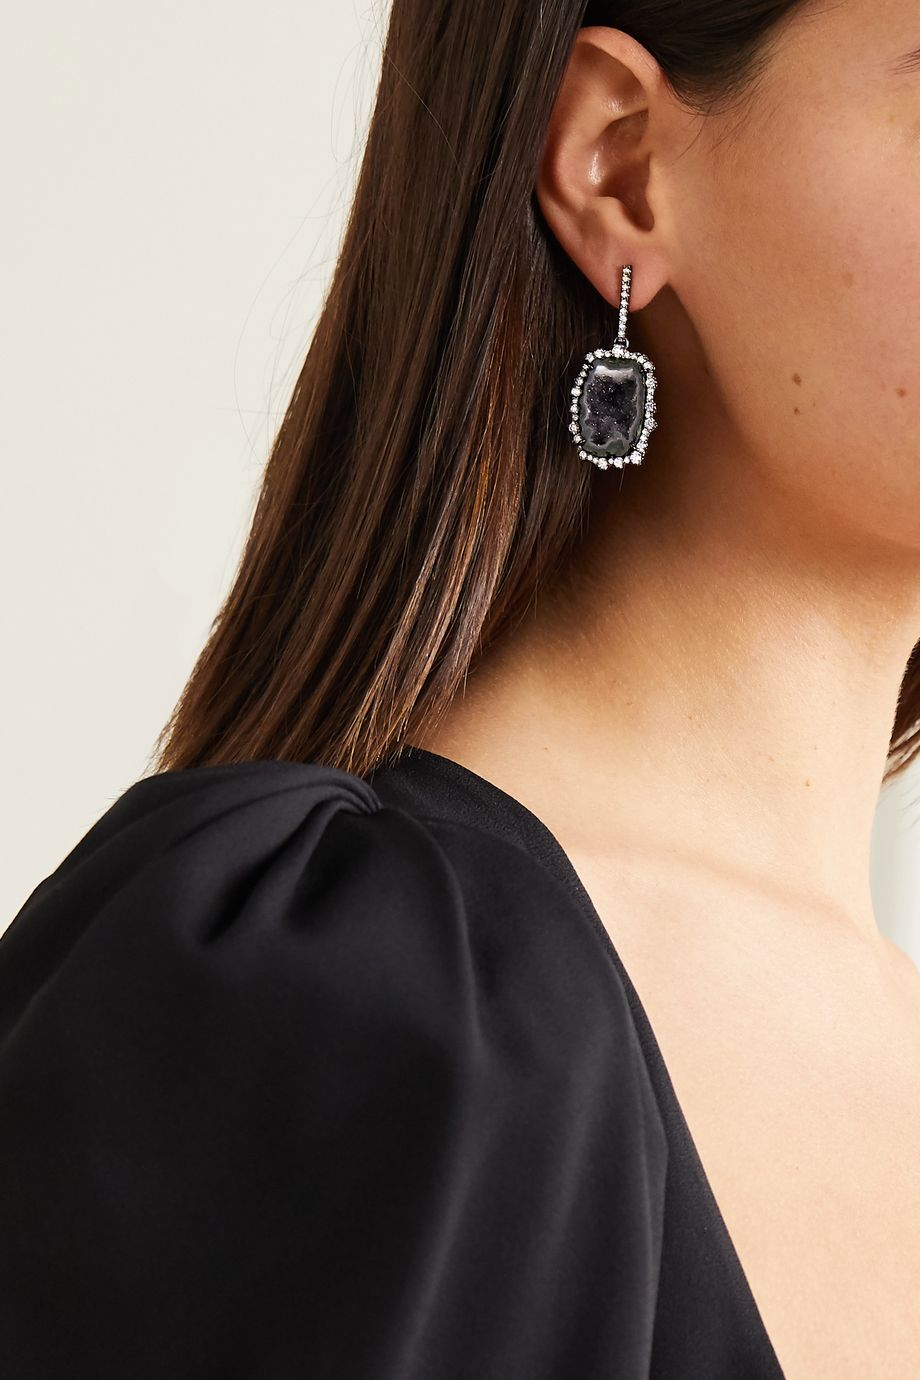 Kimberly McDonald 18-karat blackened white gold, geode and diamond earrings